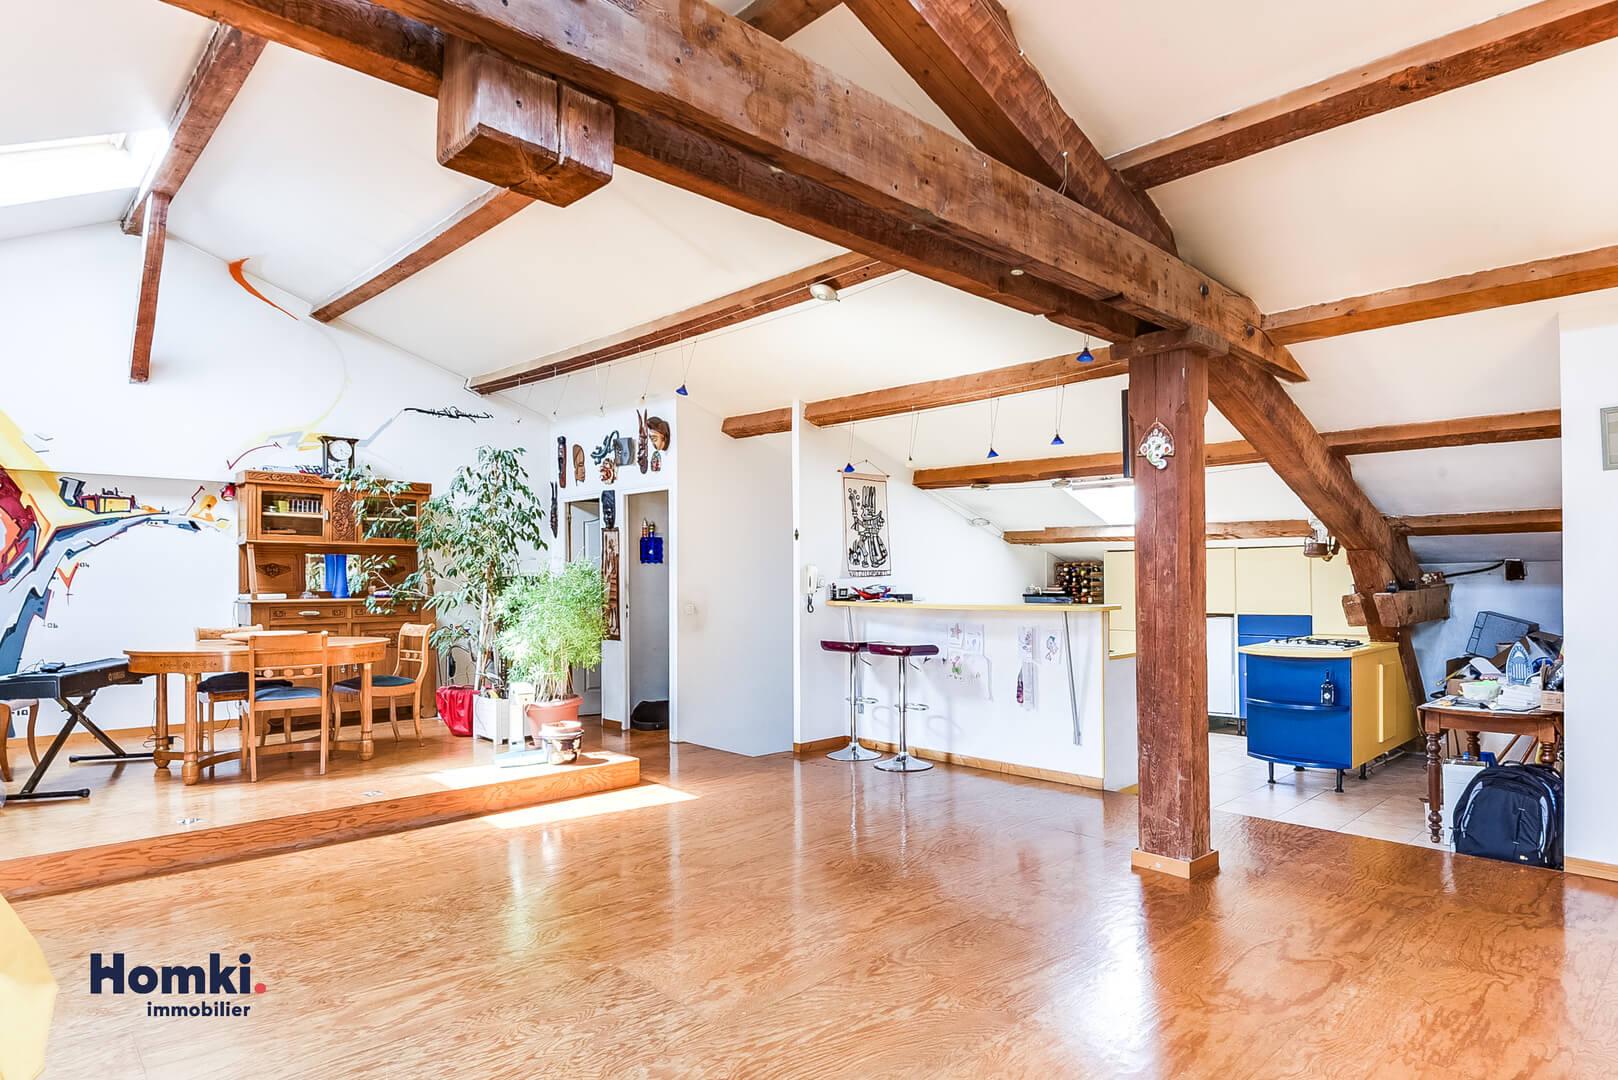 Vente loft Marseille T3 13013 130m²_1